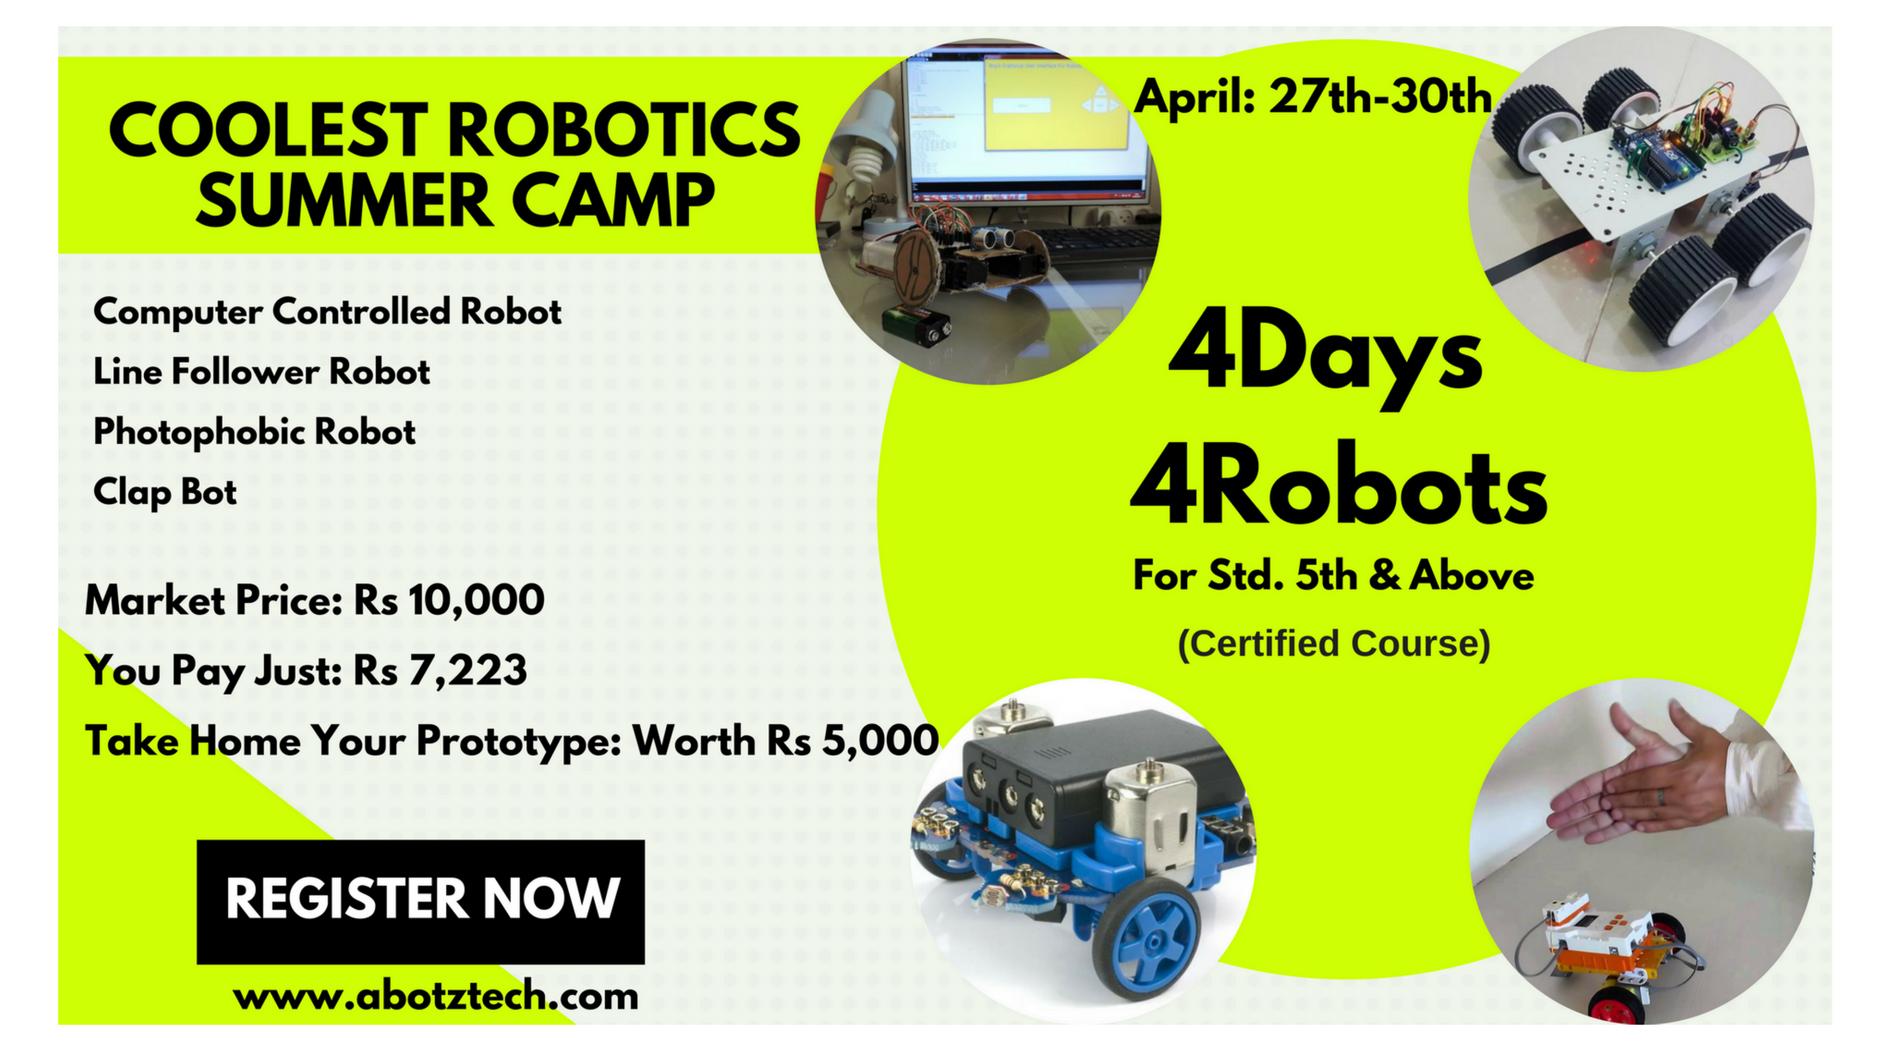 Robotics Summer Camp - 4 Days 4 Robots Workshop (Certified Course)